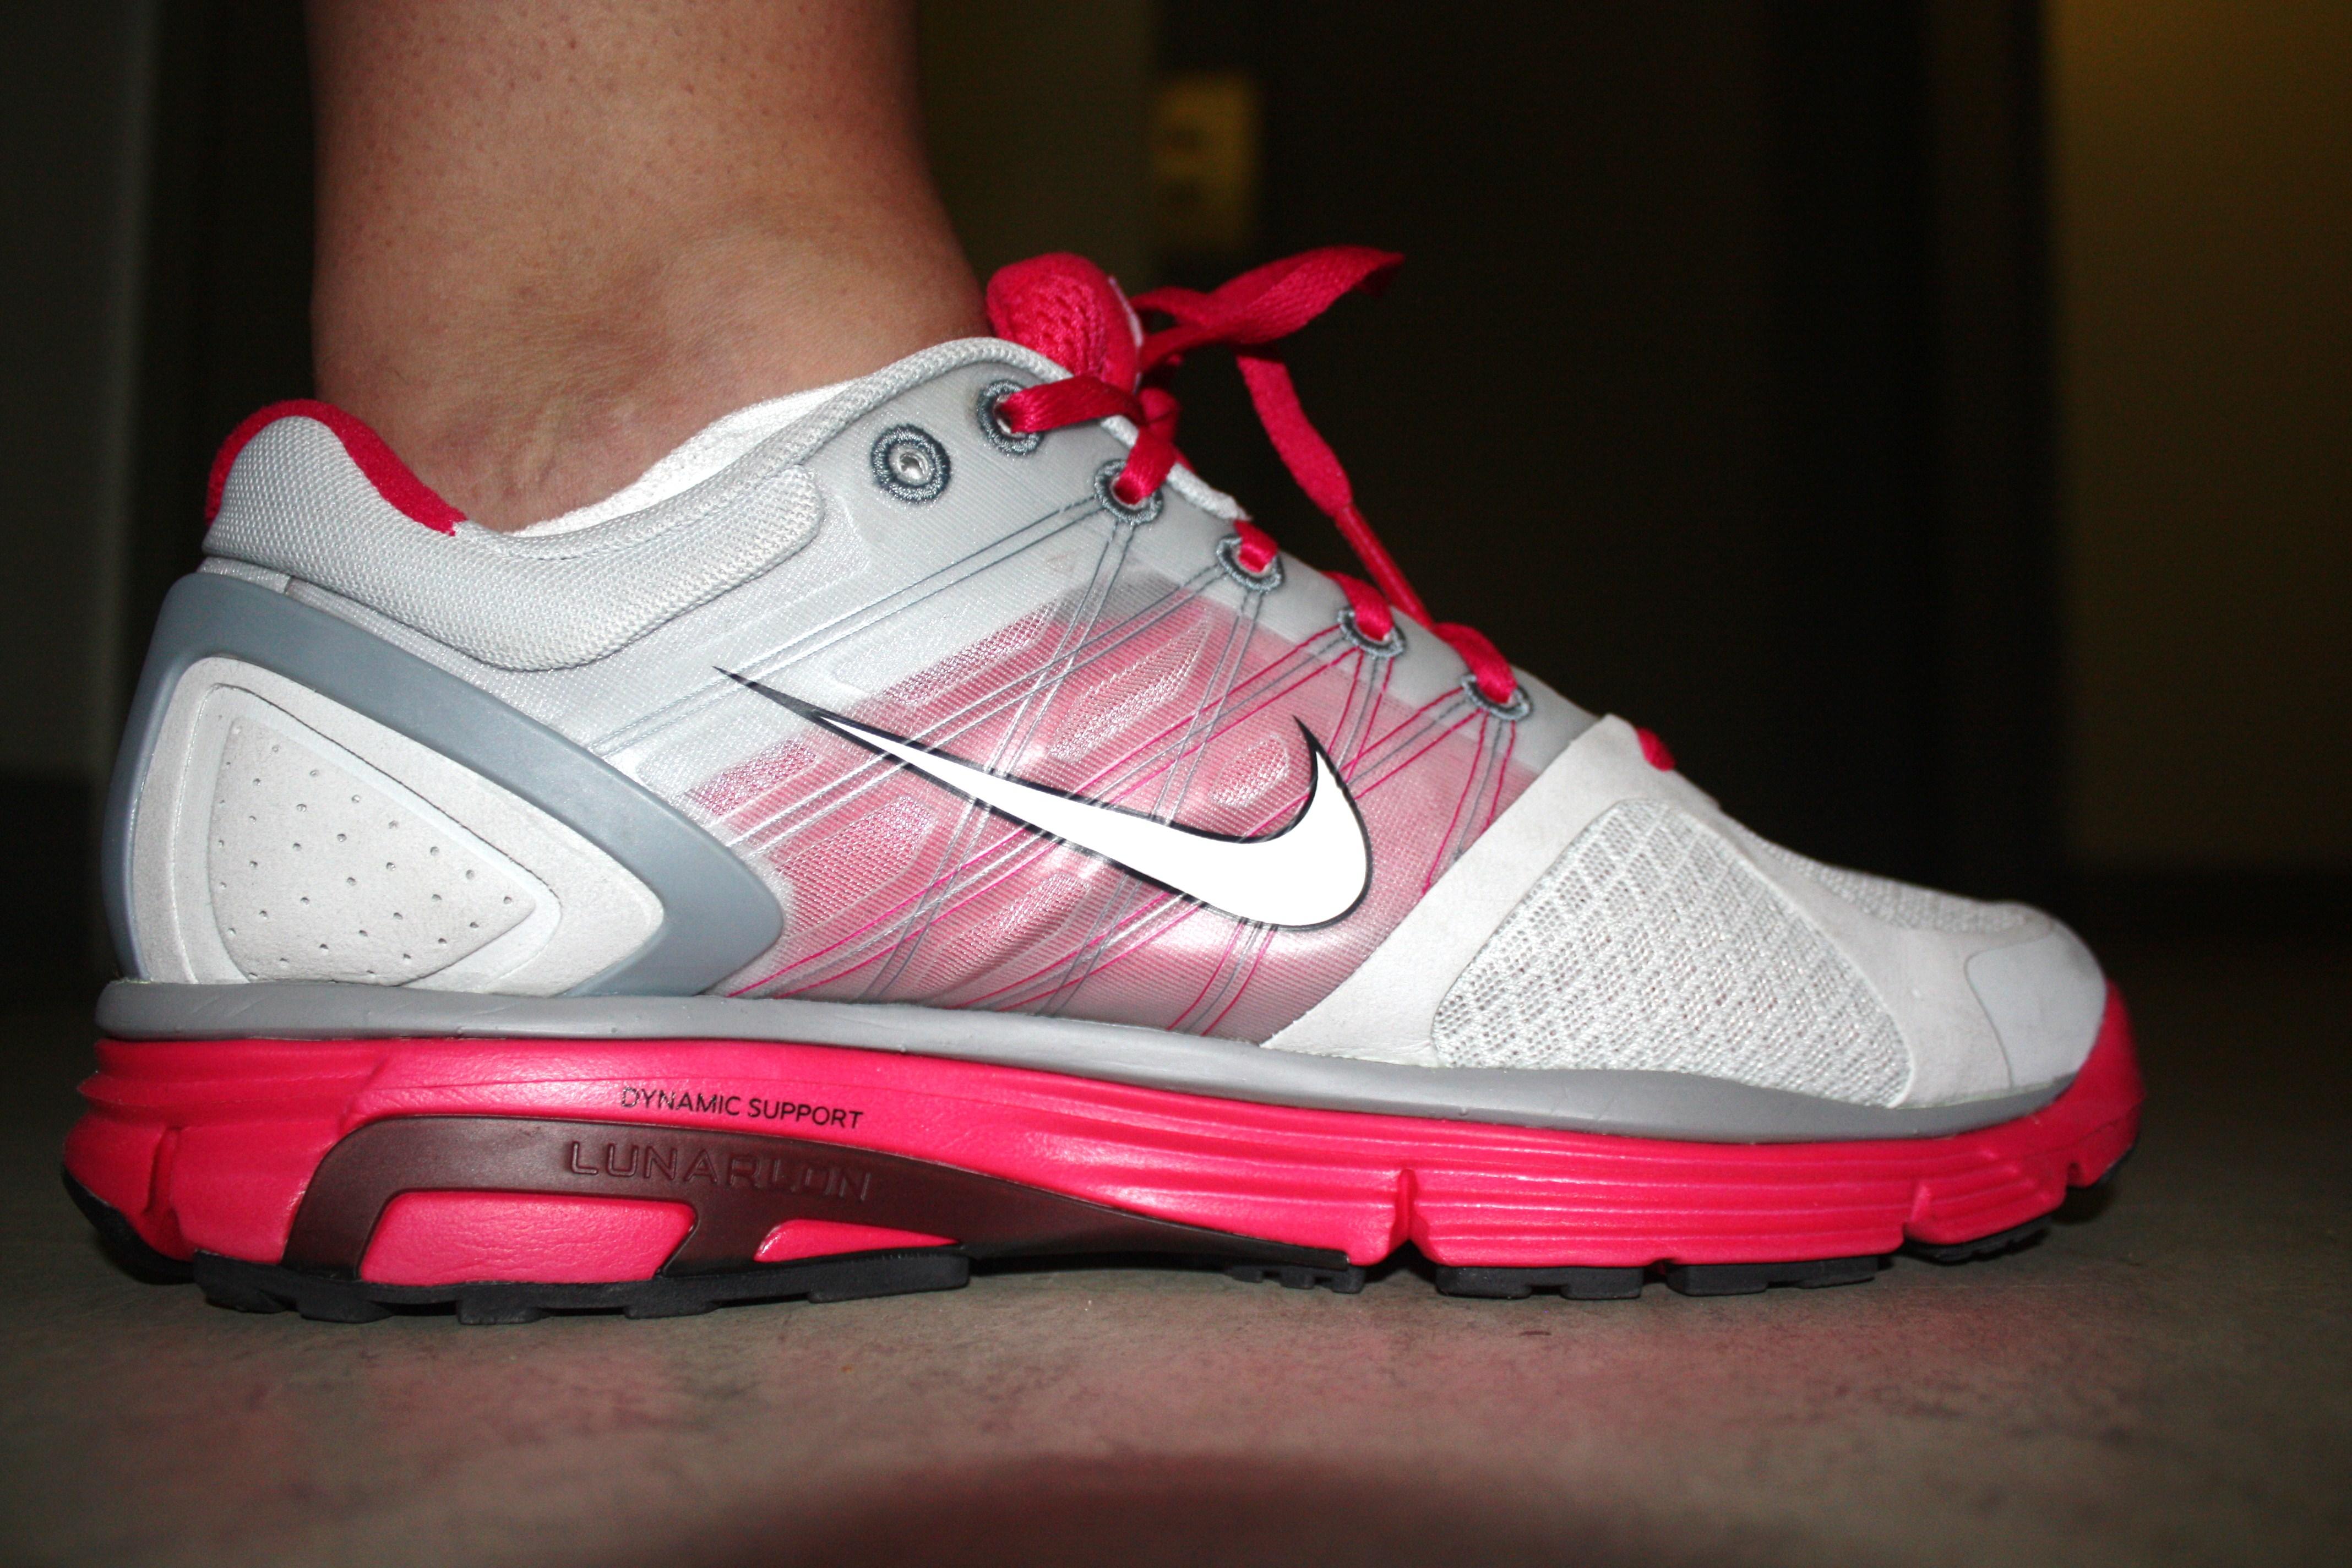 Nike Lunarglide 2 Flywire Boston WCjkOJdFG5